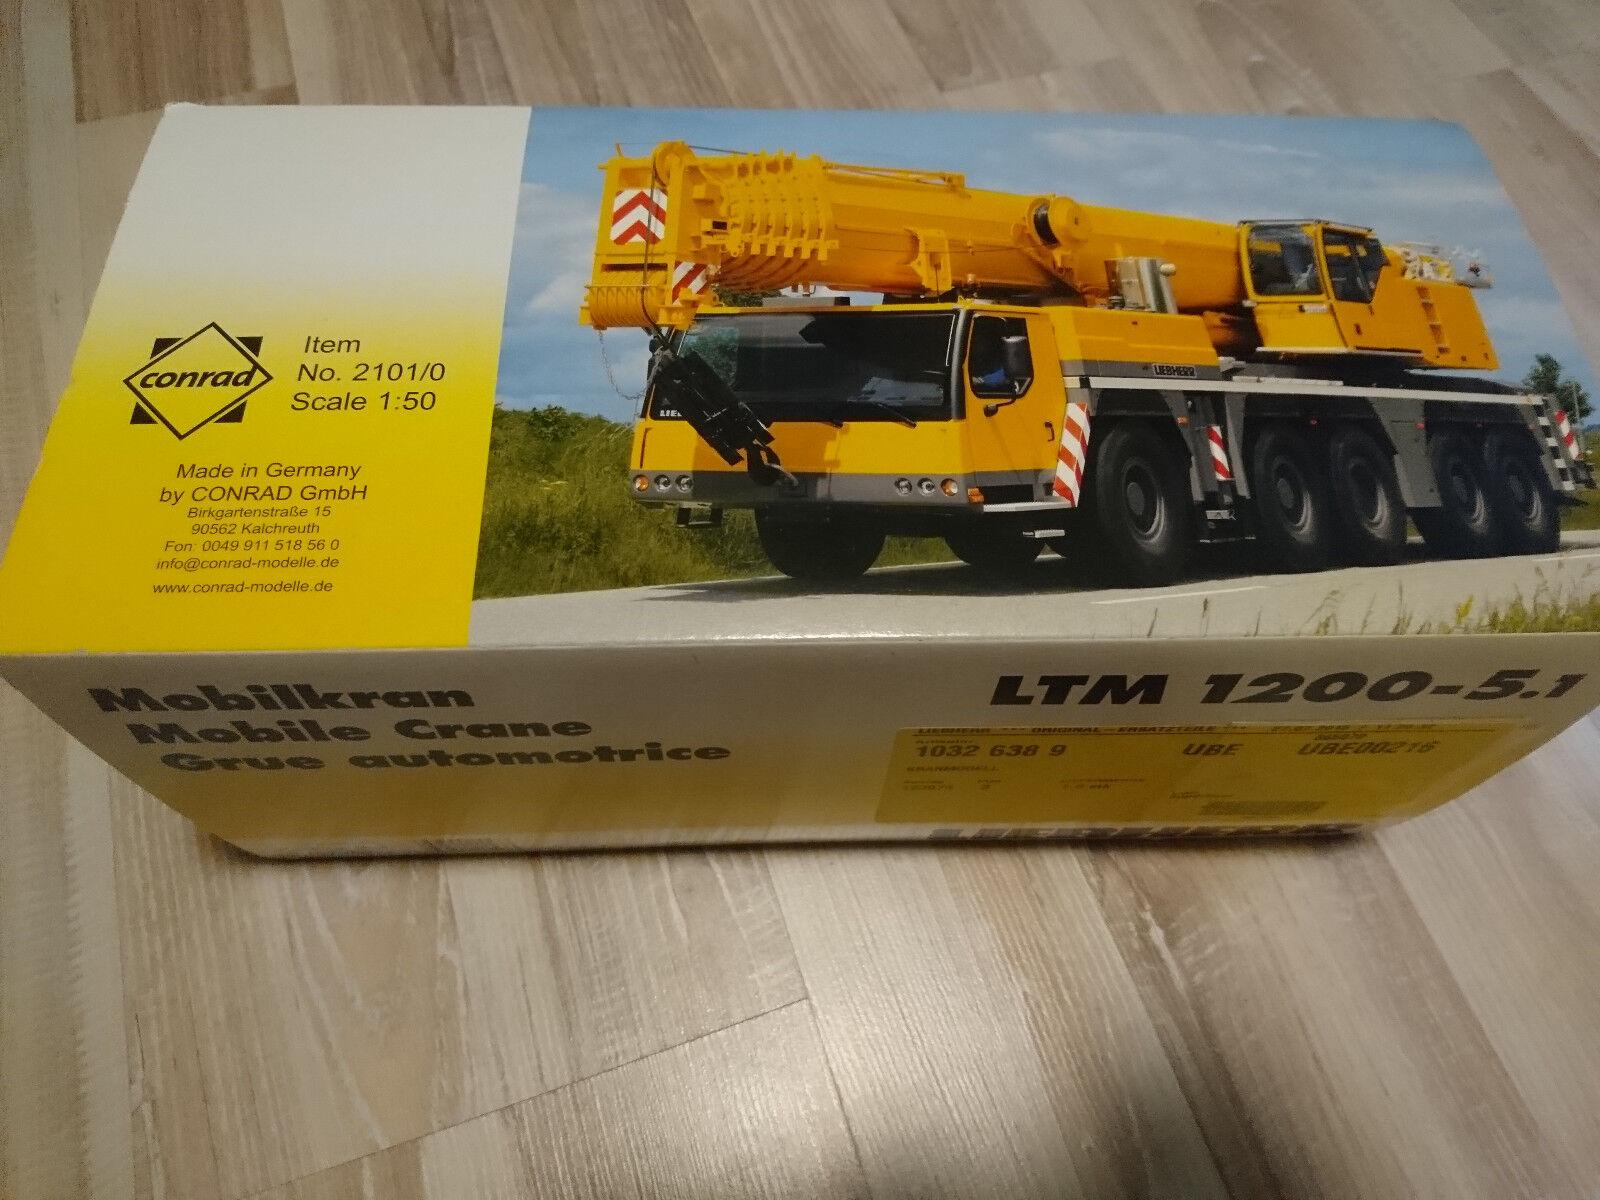 LIEBHERR LTM 1200-5.1 kranmodell 1 50 CONRAD No. 2101 0